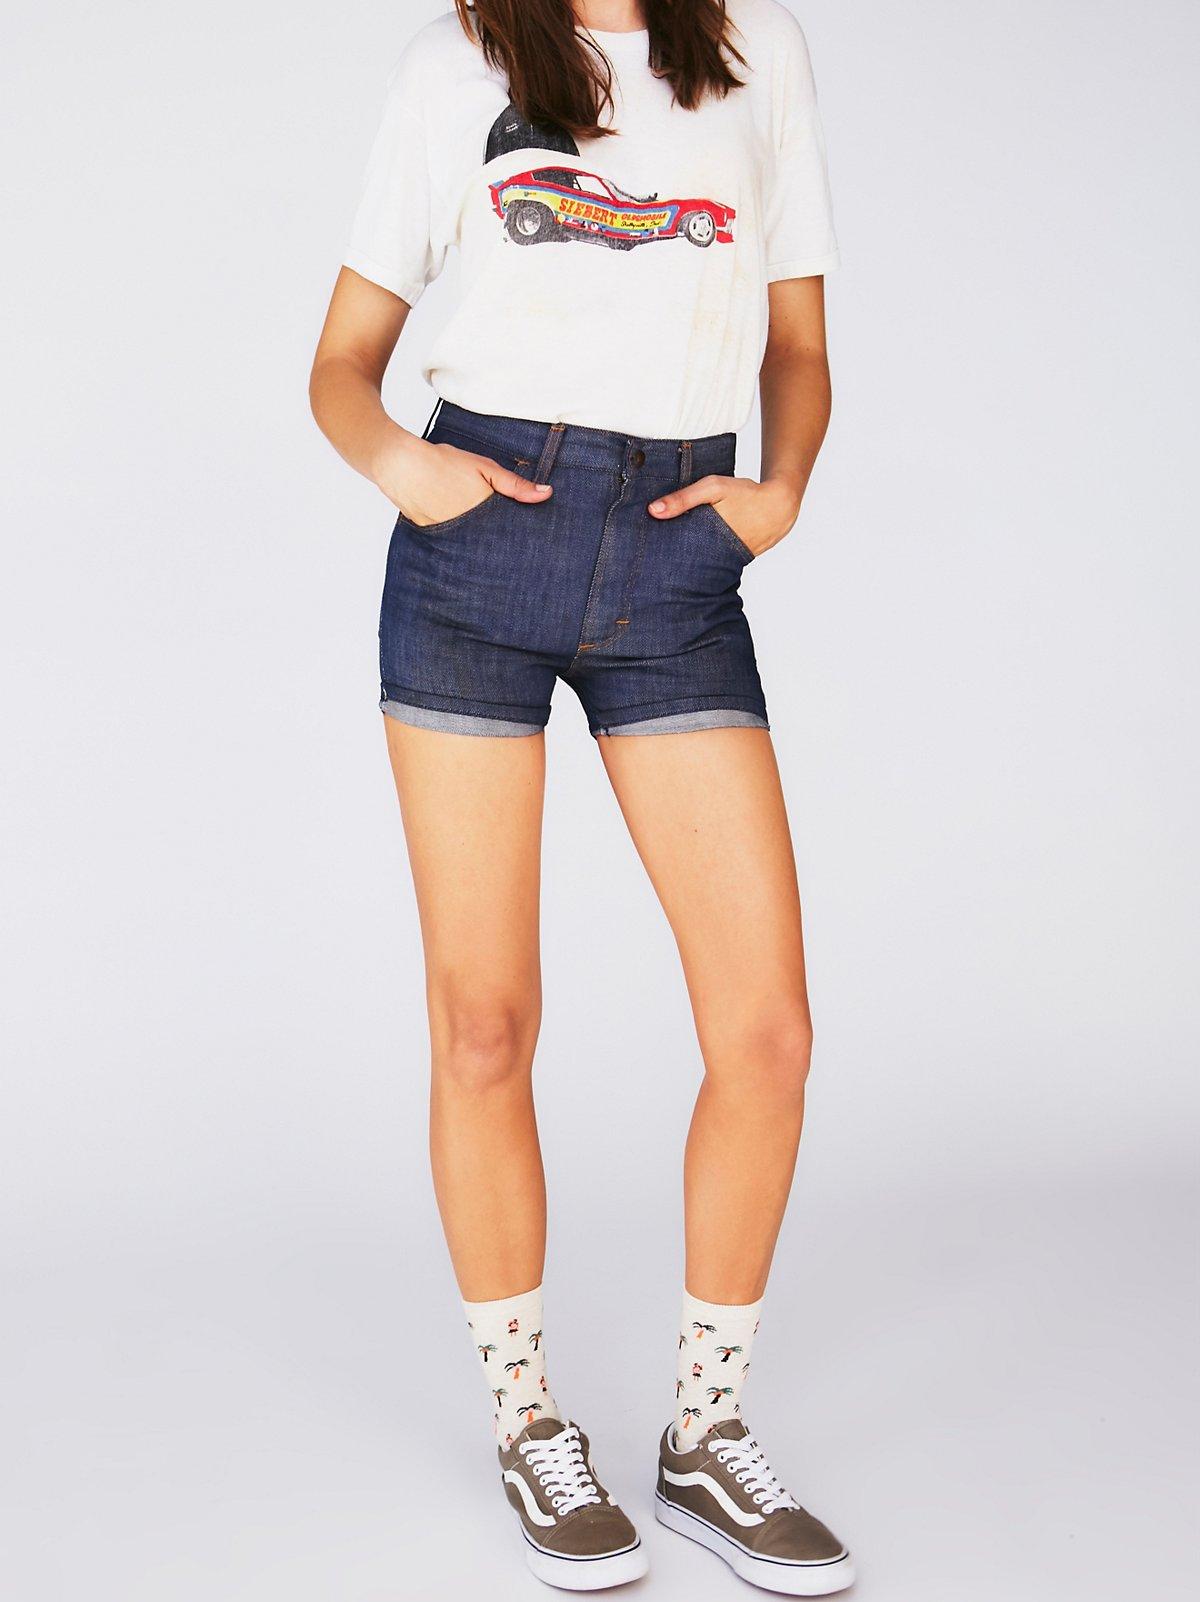 Vintage1970s Denim Shorts